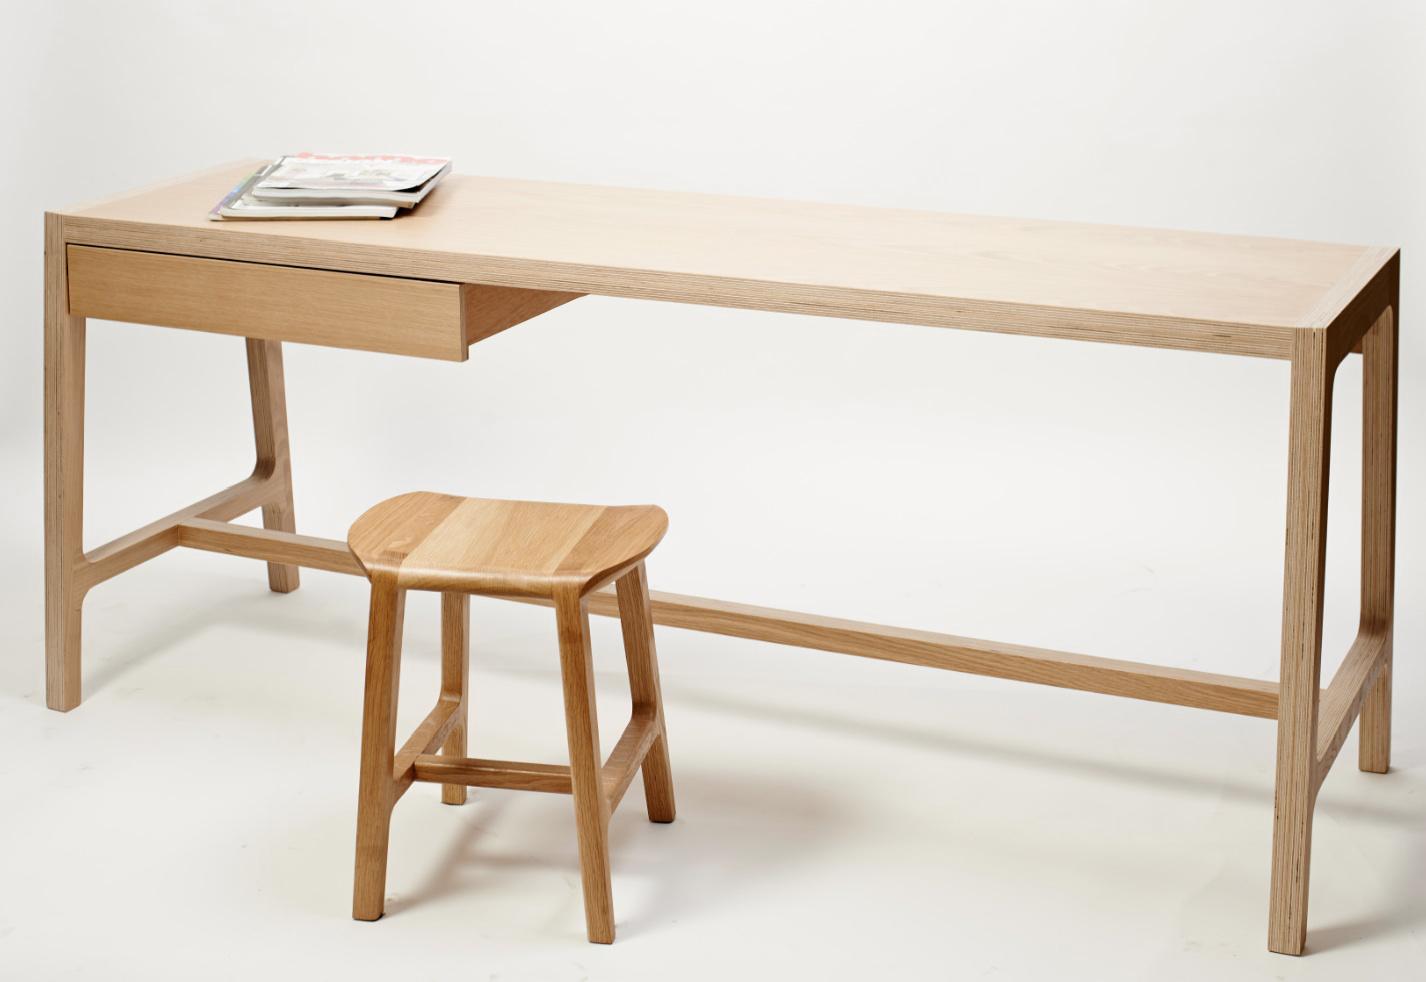 american-oak-furniture-timber-desk-melbourne-made